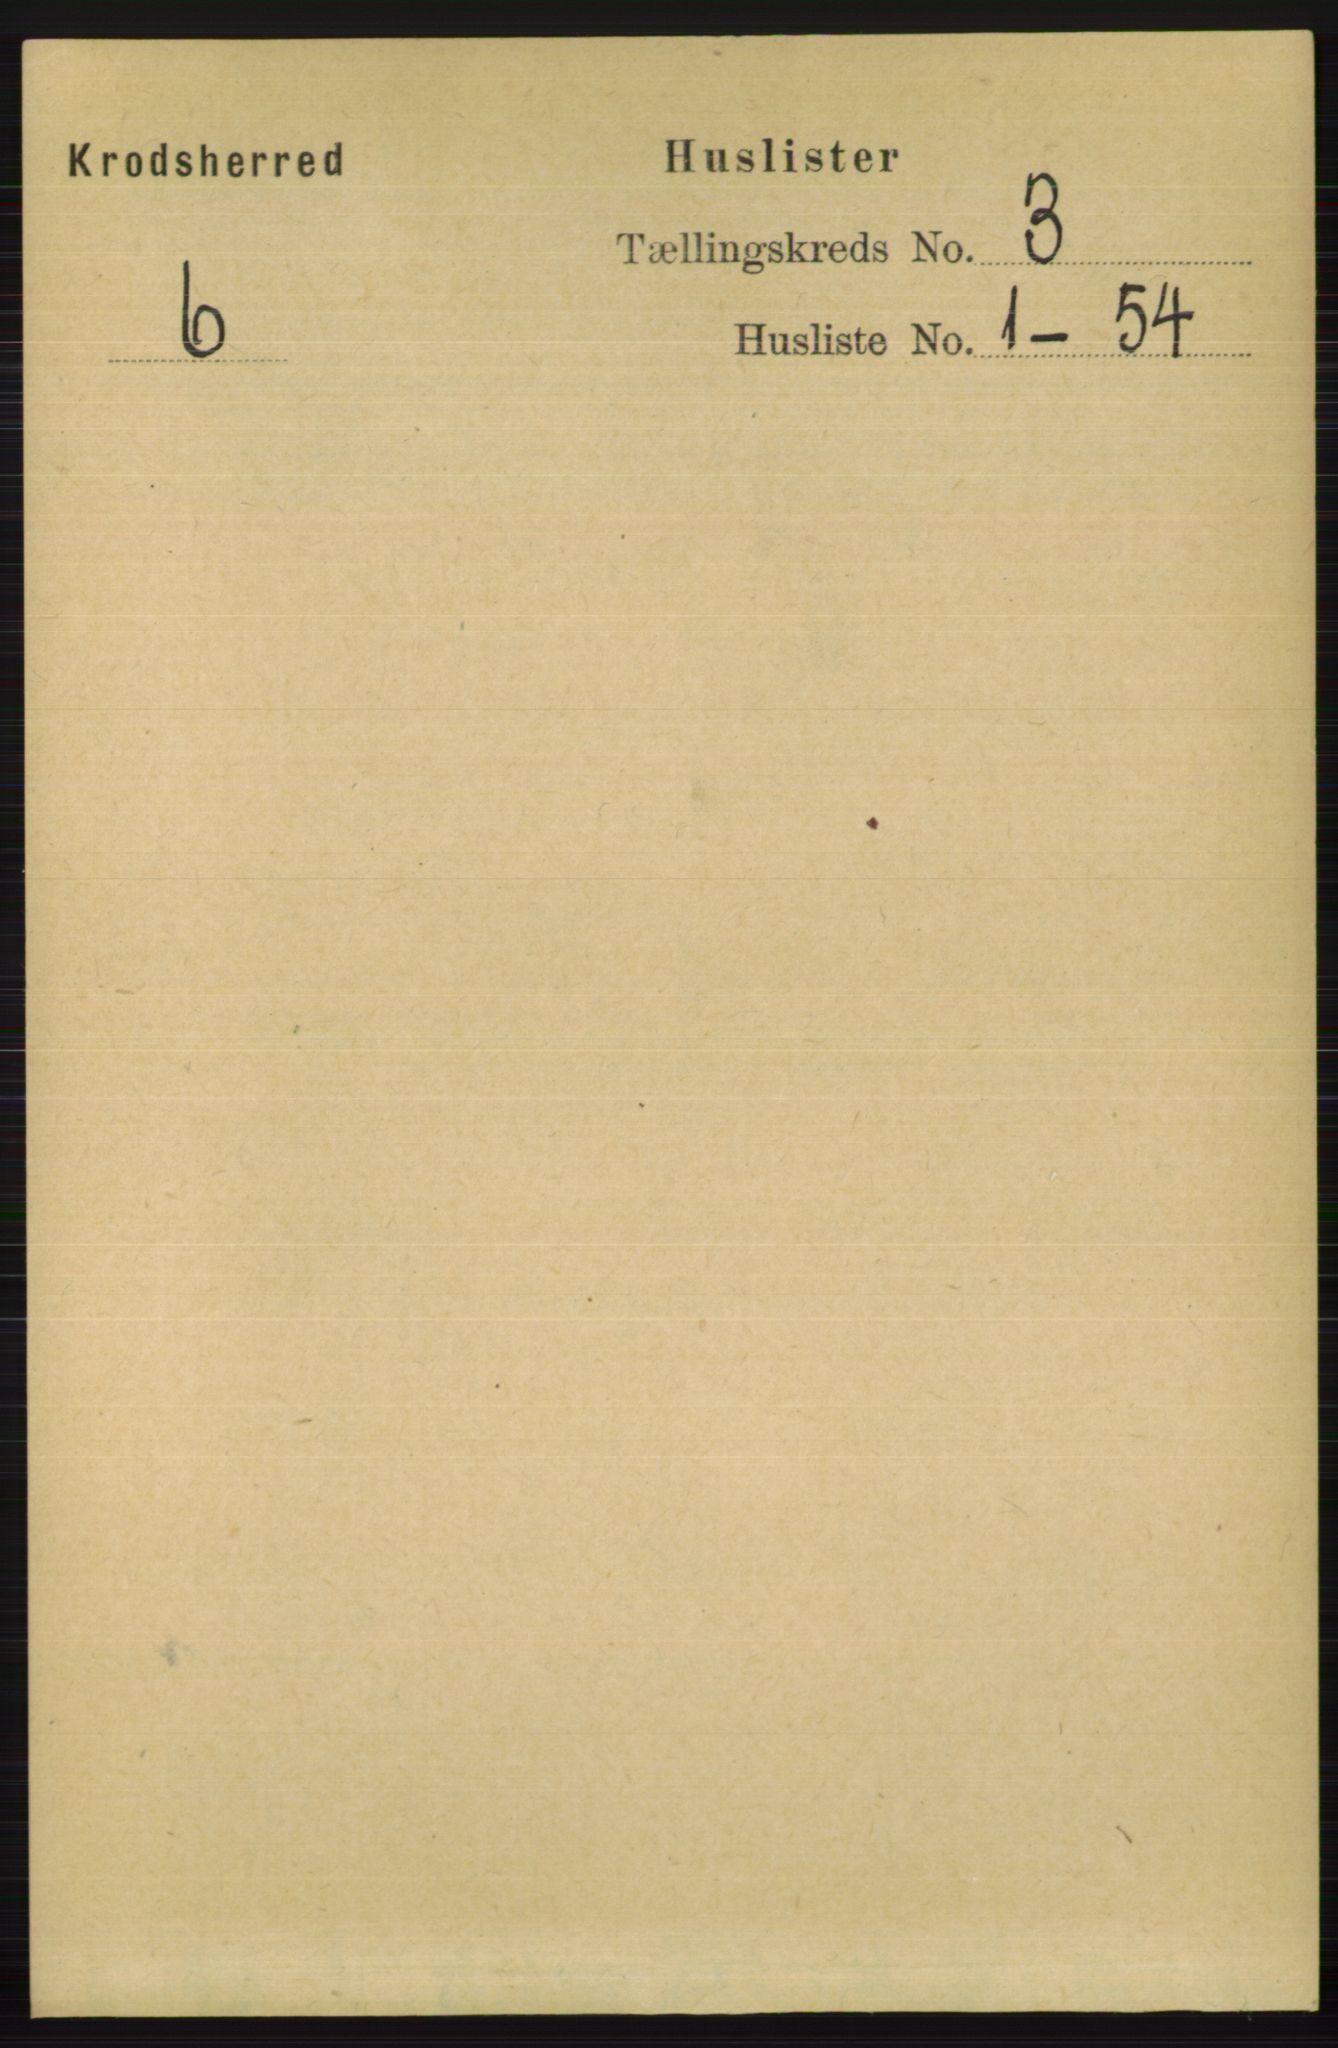 RA, Folketelling 1891 for 0621 Sigdal herred, 1891, s. 5521